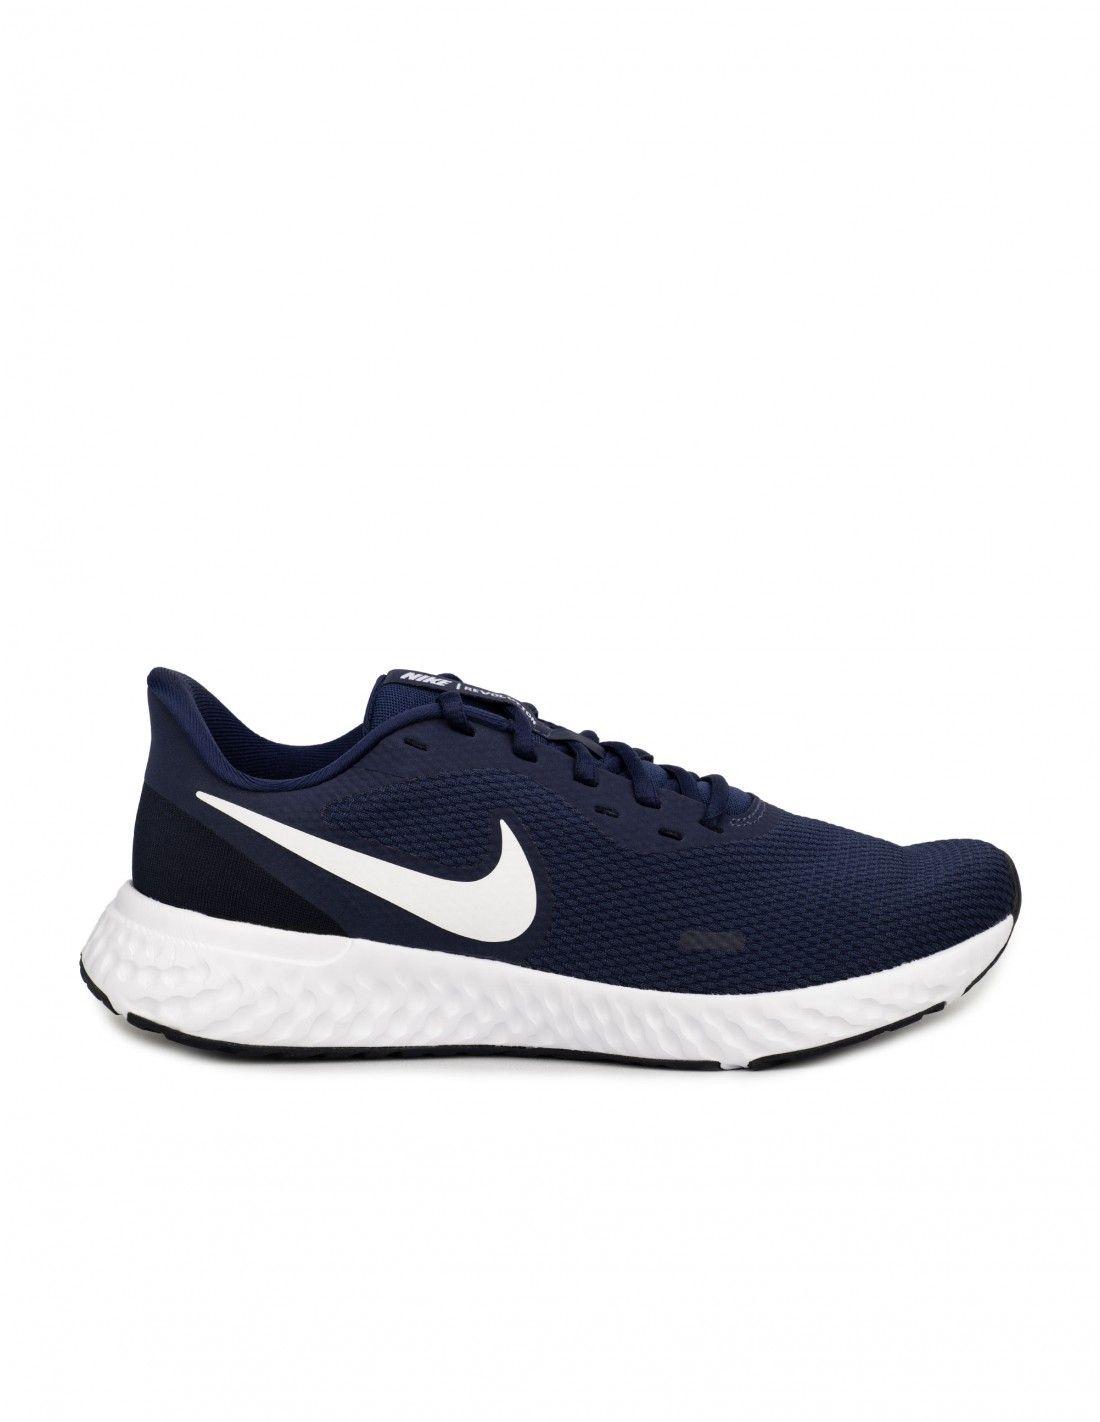 Nike Revolution 5 Azul Marino Hombre Zapatillas Nike Azules Nike Azules Zapatos Nike